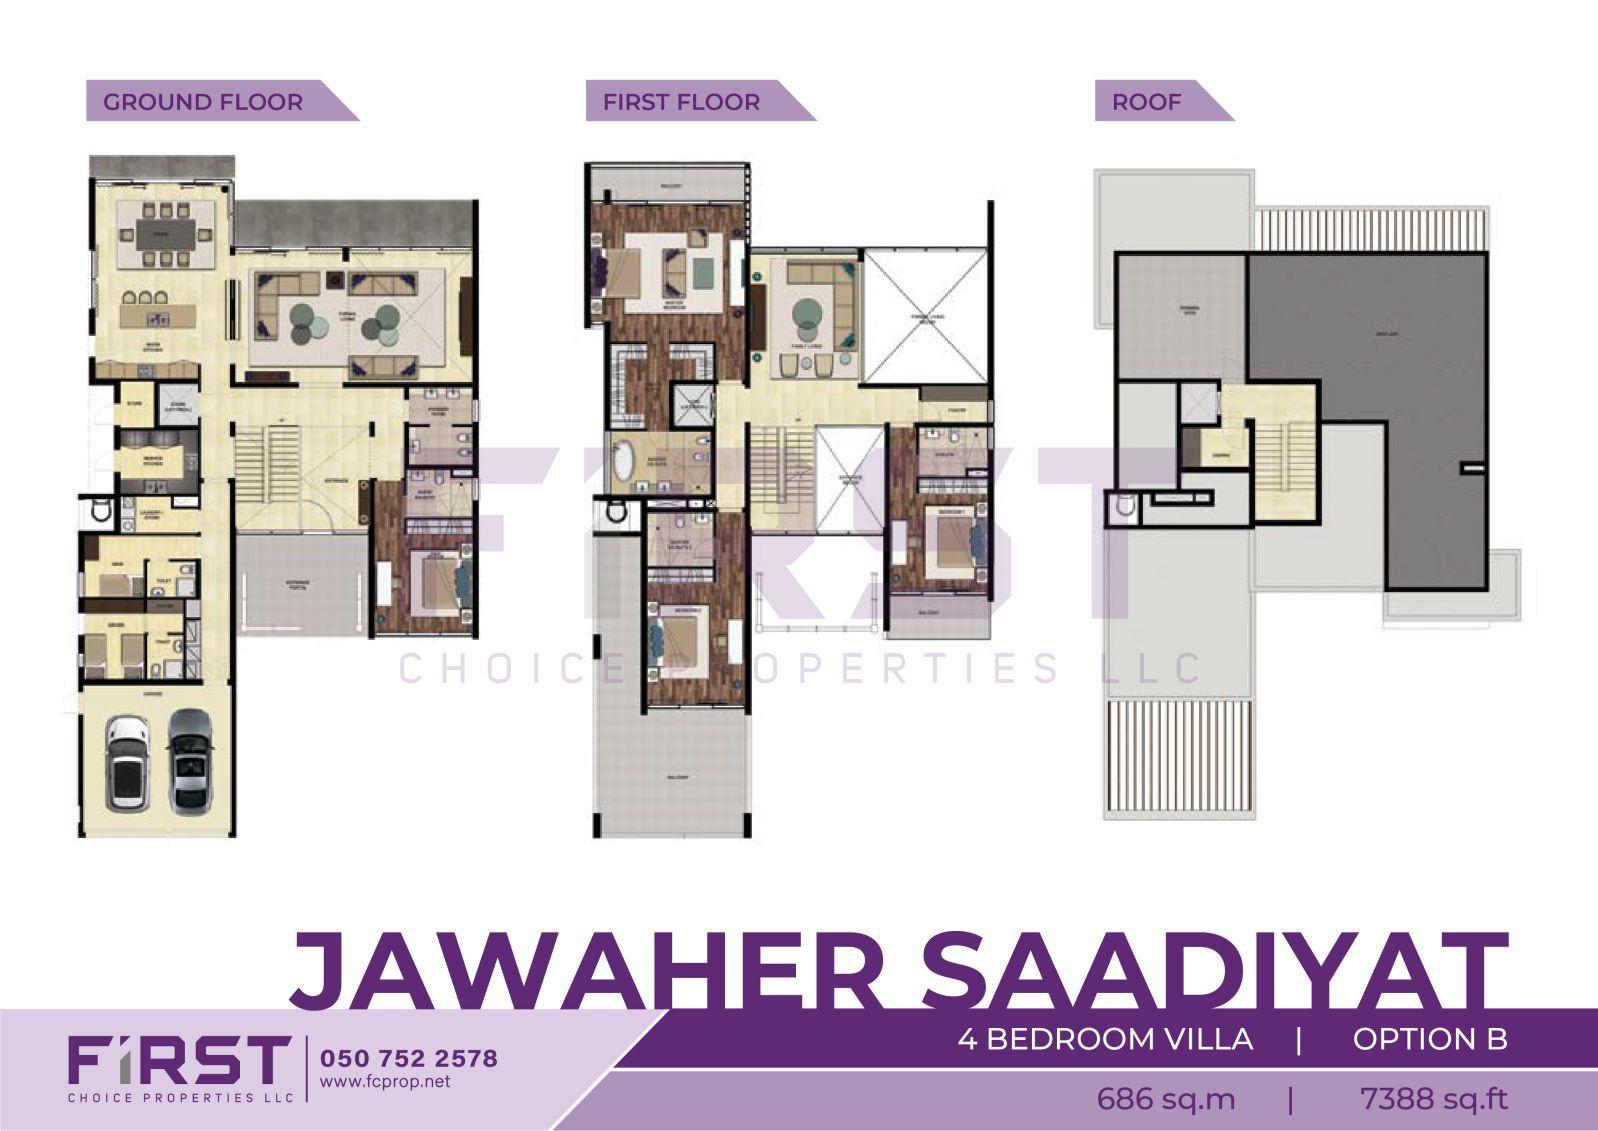 Floor Plan of 4 Bedroom Villa Option B in Jawaher Saadiyat Saadiyat Island Abu Dhabi UAE 686 sq.m 7388 sq.ft.jpg